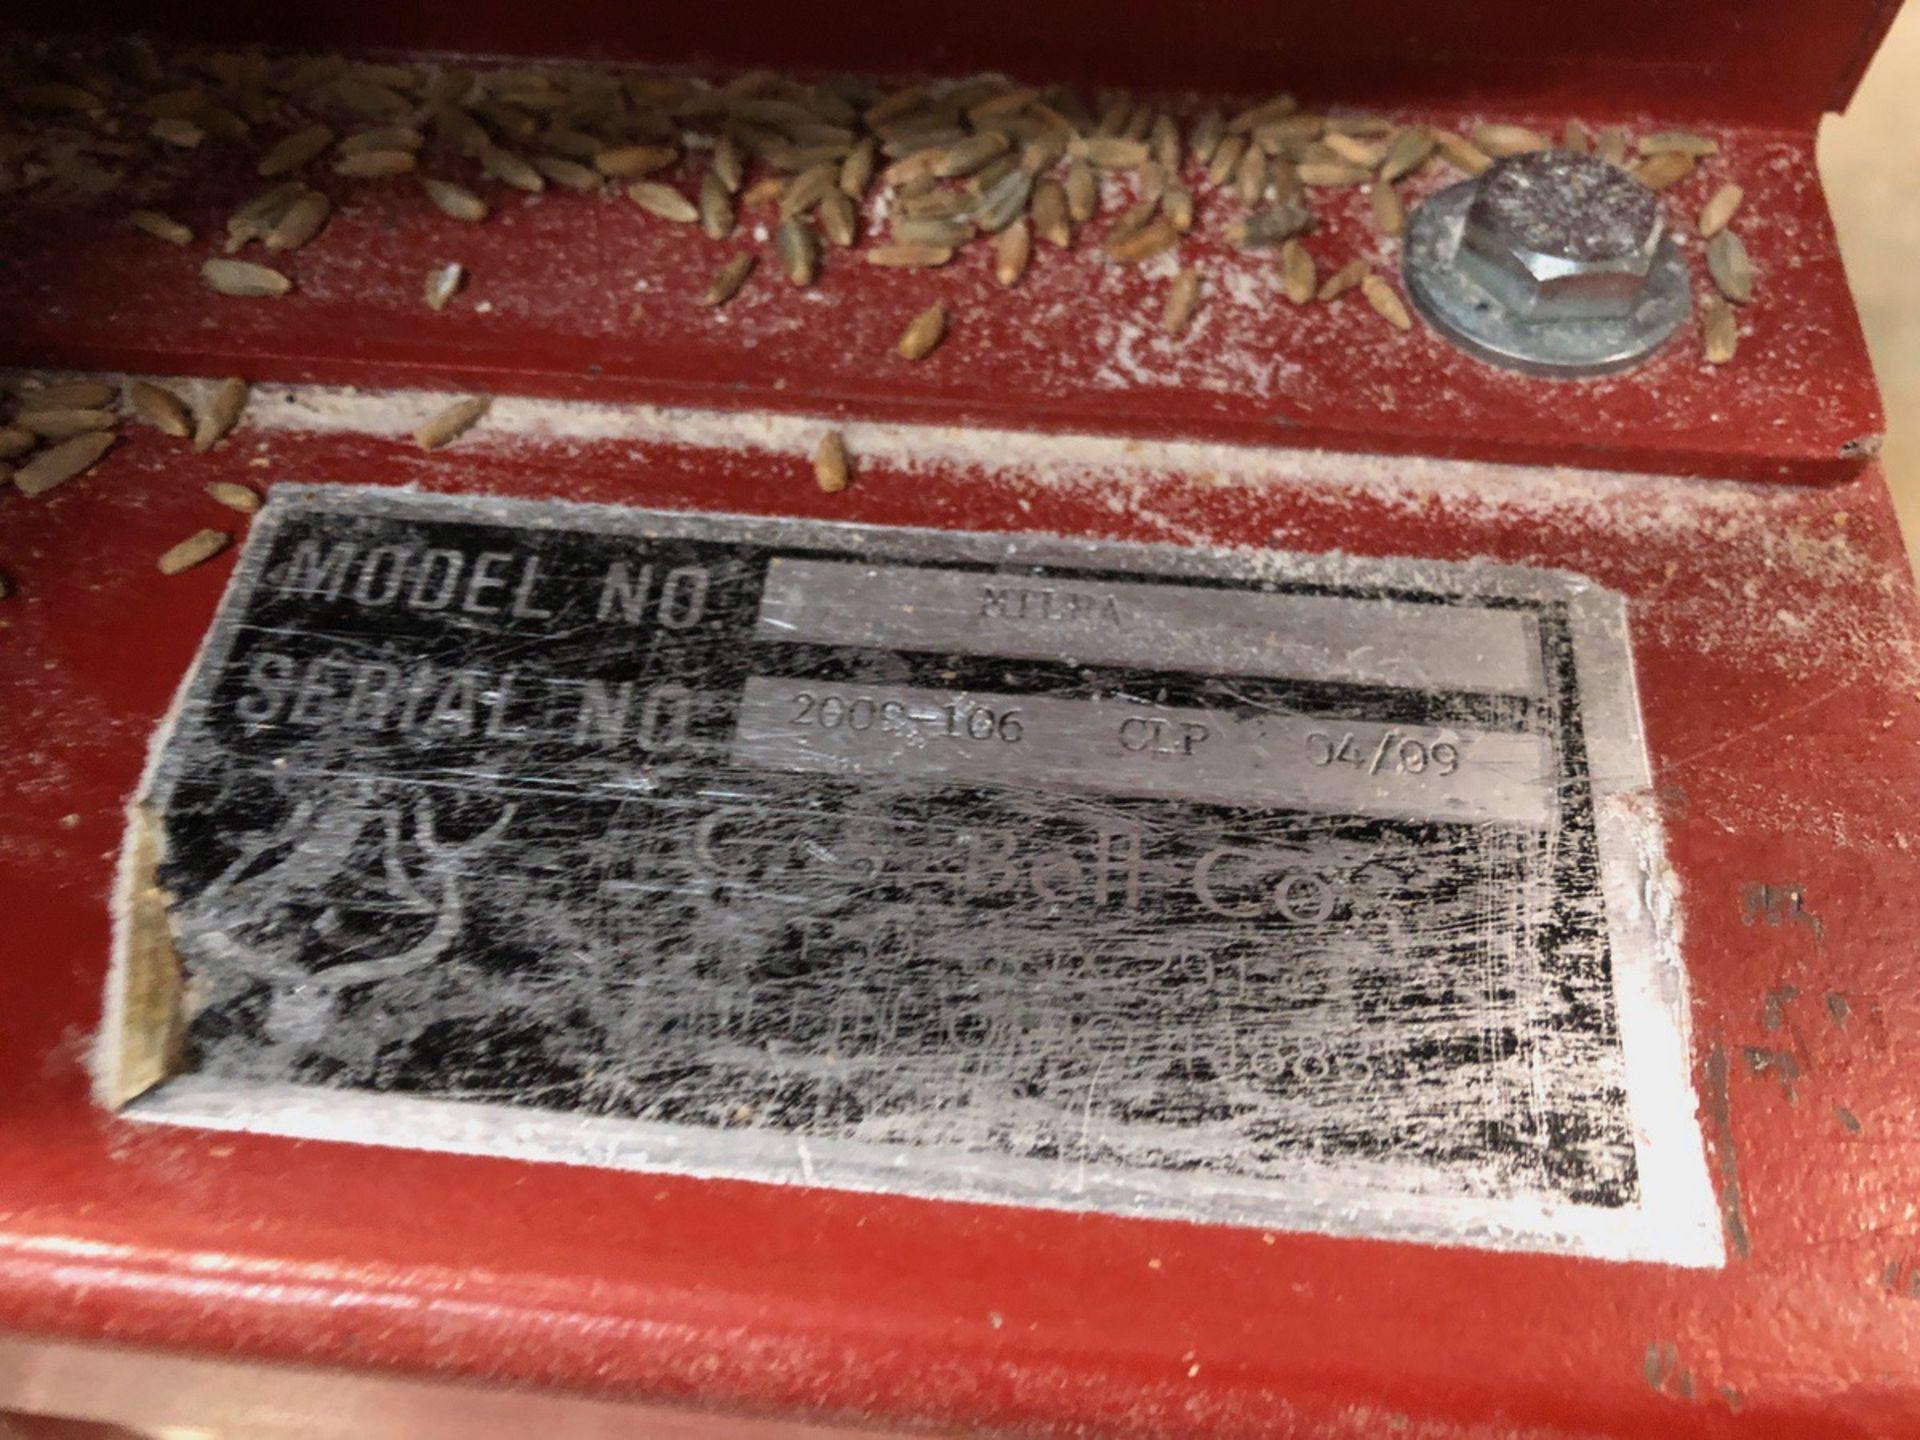 Lot 23 - 2009 CS Bell Model MILPA Mill, S/N: 2009-106 CIP 04/09 | Sub to Bulk | Rig Fee: $100